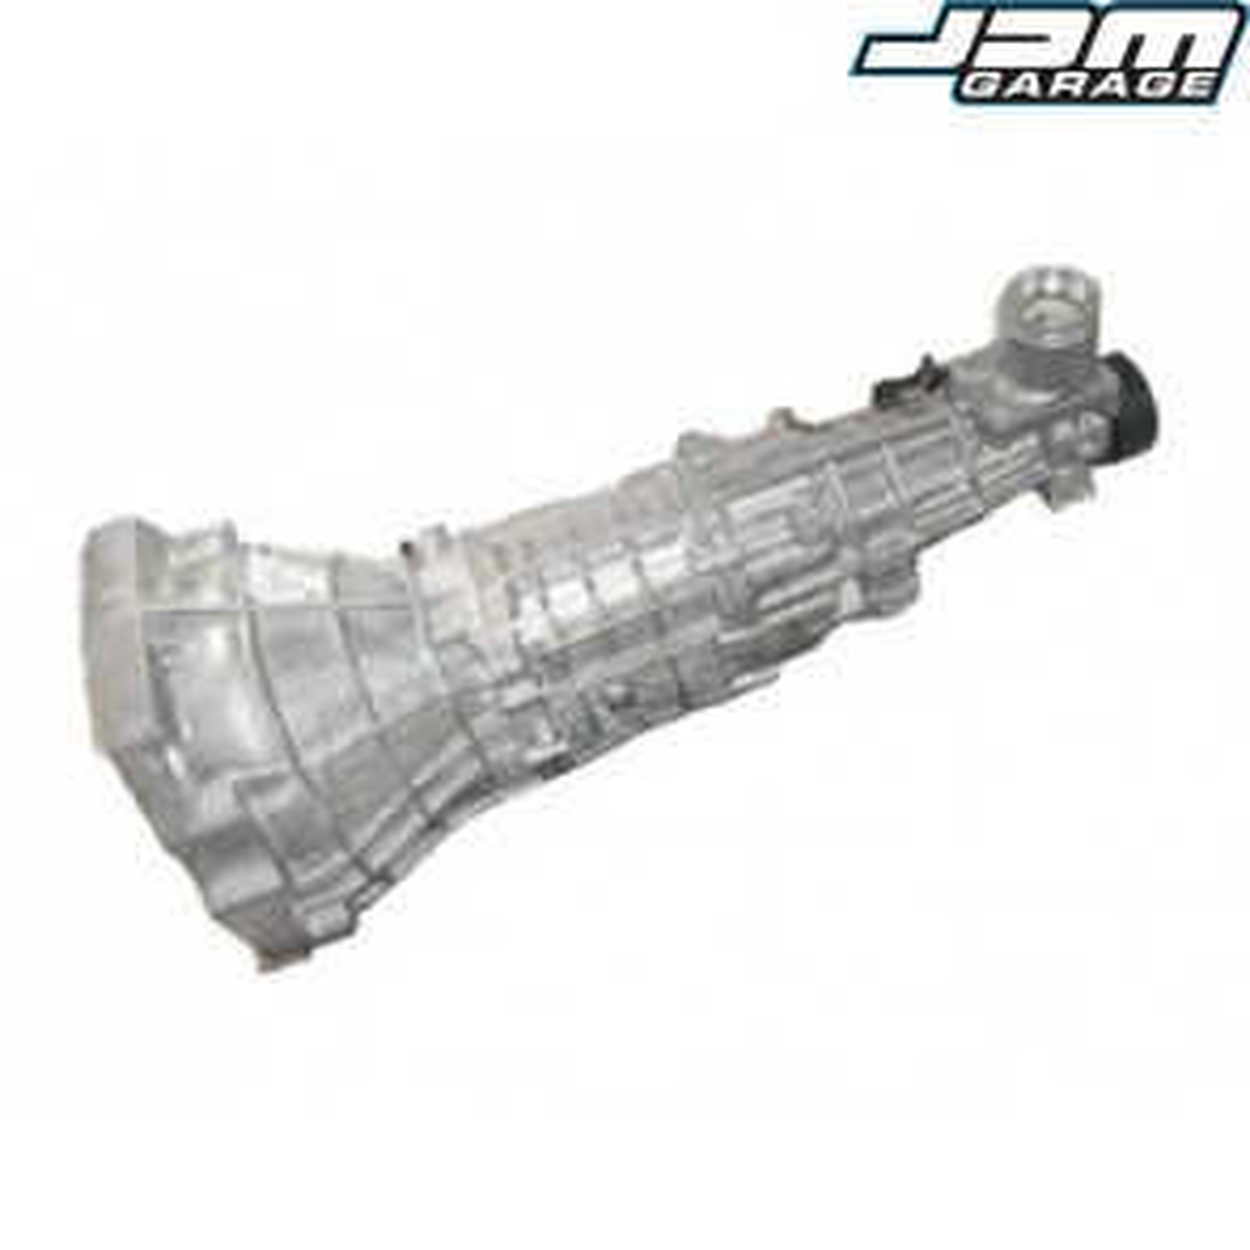 Genuine Nissan Gearbox for Nissan Skyline R33 GTS-T R34 GTT RB25DET NEO